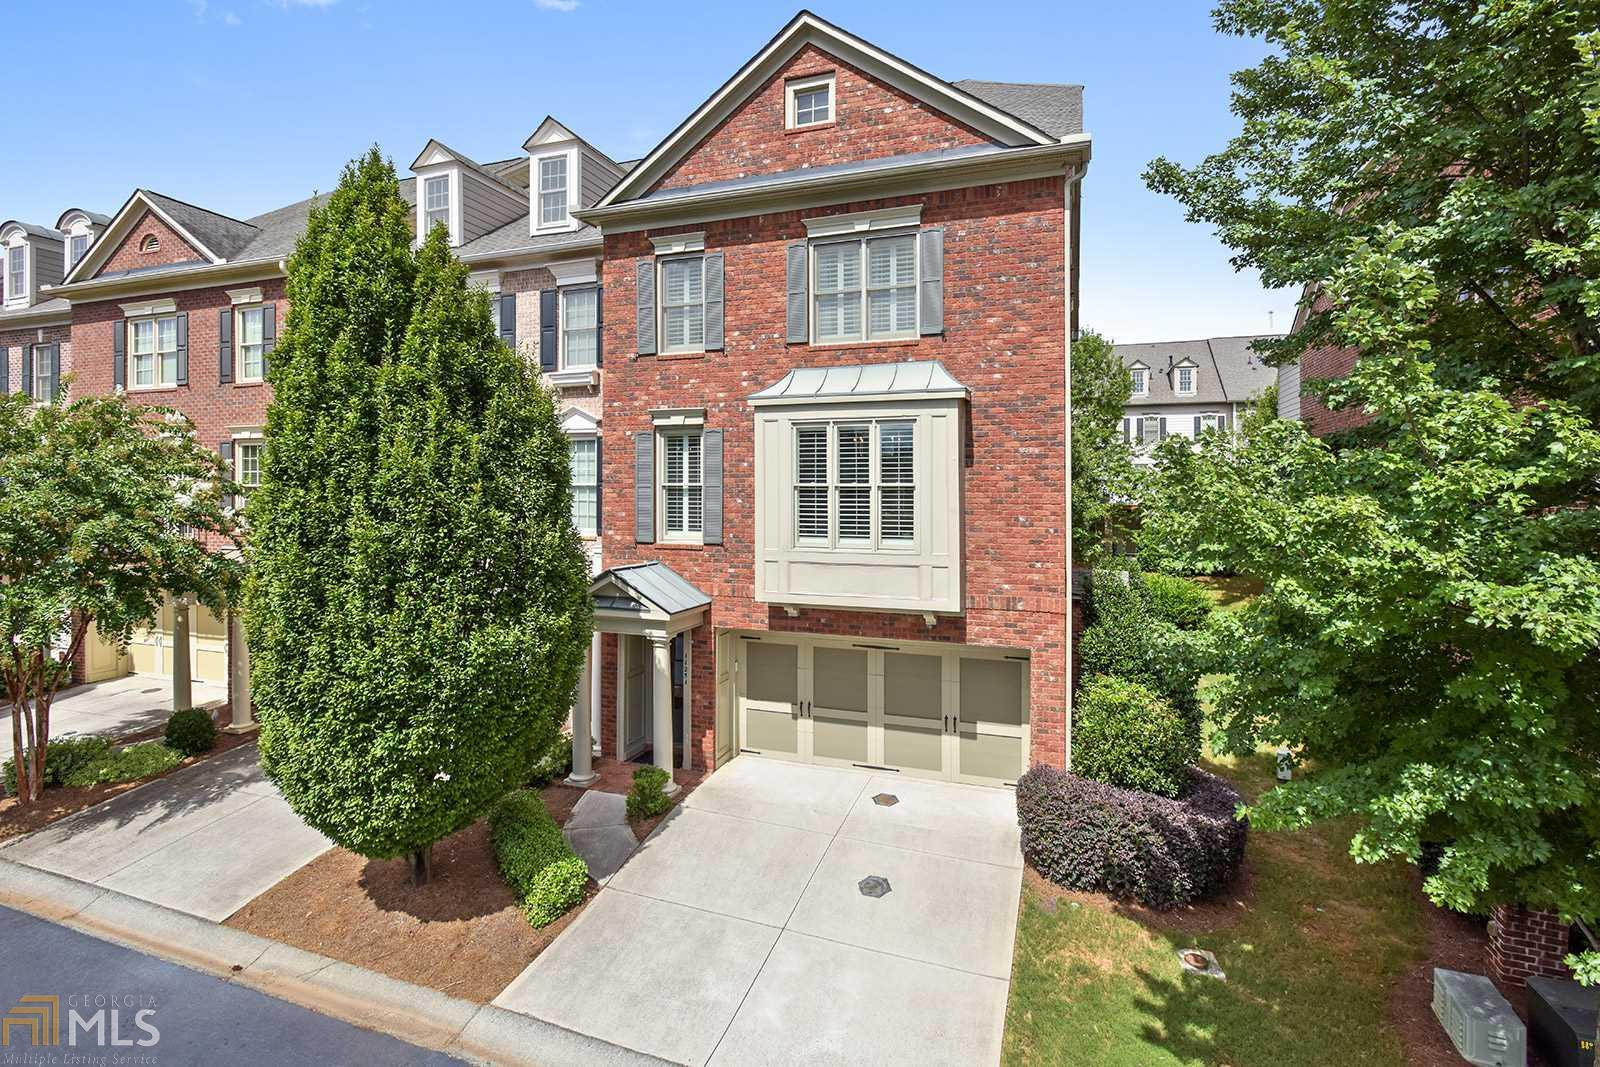 11251 Calypso Dr Alpharetta Ga Mls 8250411 Better Homes And Gardens Real Estate